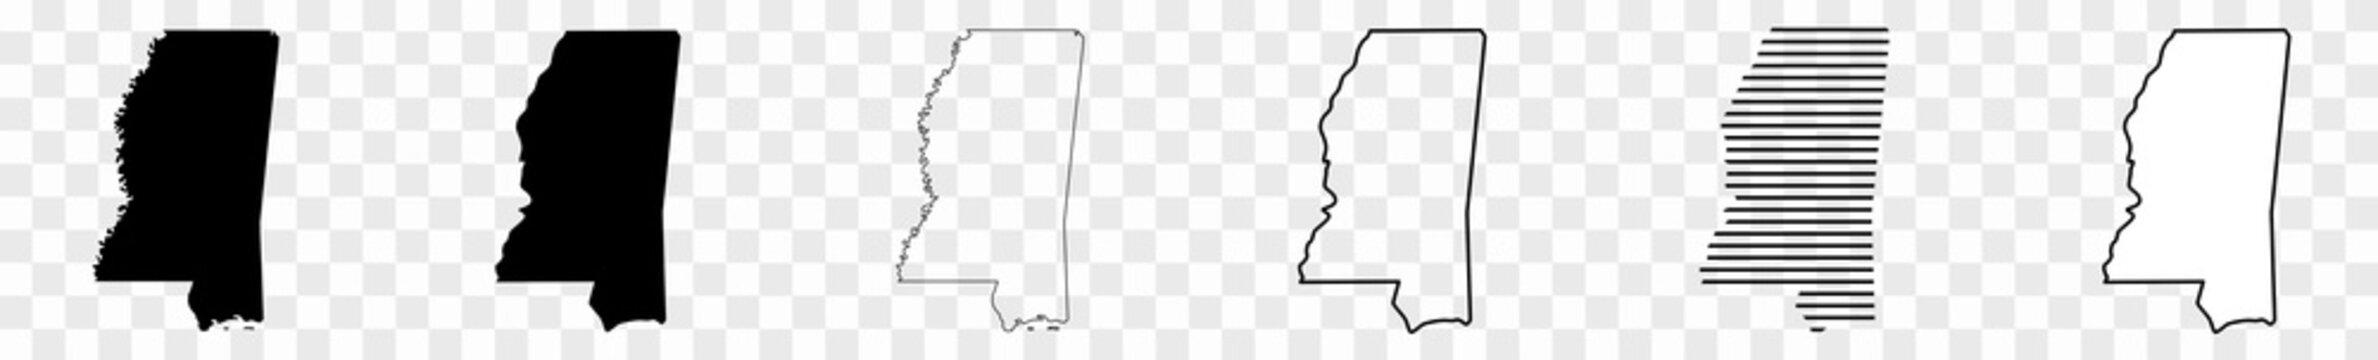 Mississippi Map Black | State Border | United States | US America | Transparent Isolated | Variations